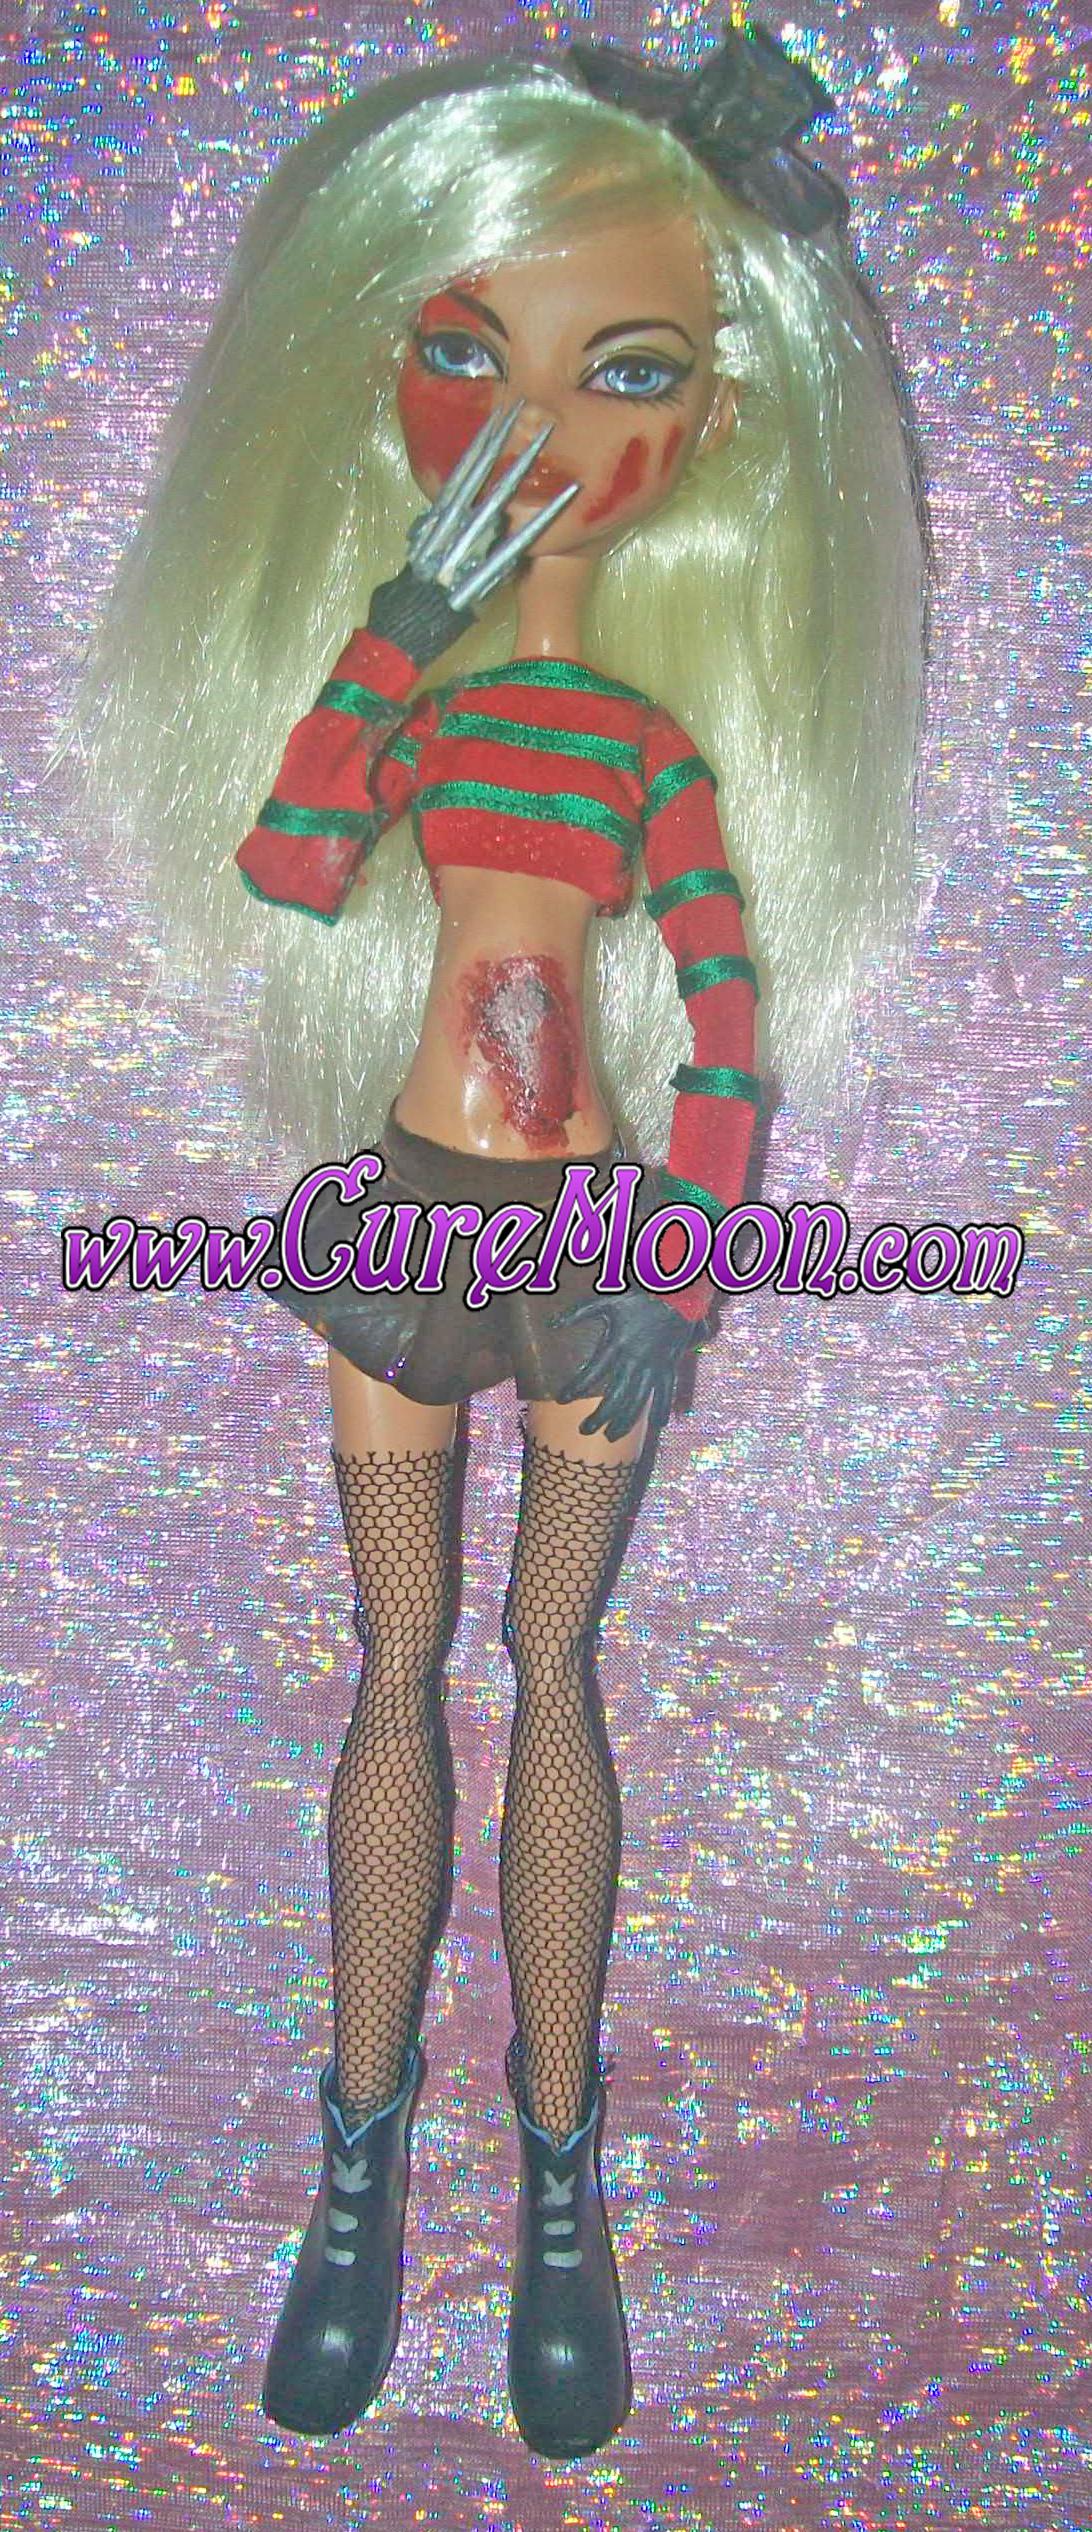 monster-high-bambola-doll-ooak-handmade-custom-freddy-kruger-meddy-curemoon-bunnytsukino